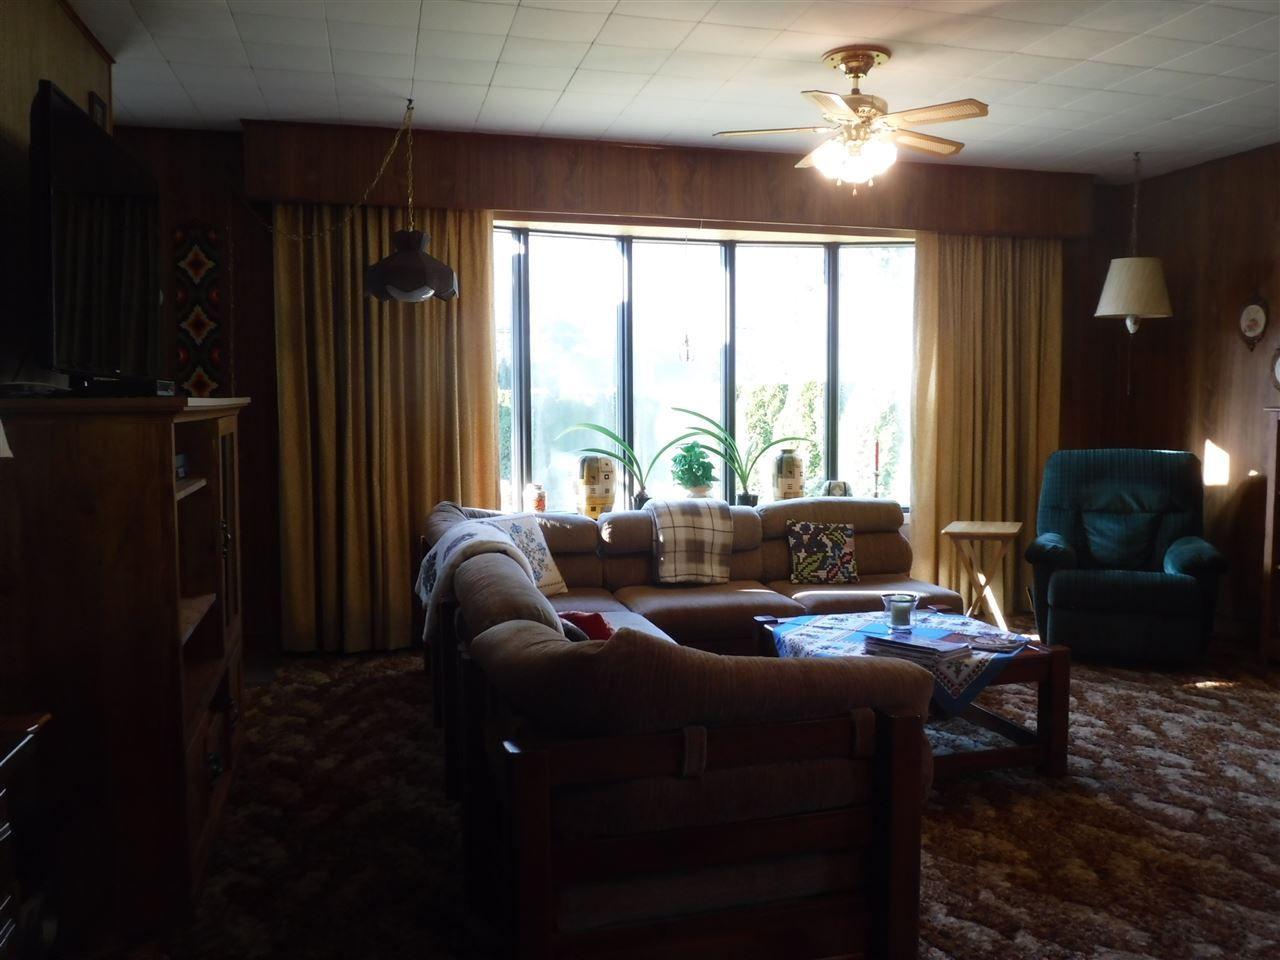 Photo 11: Photos: 1599 MACKENZIE Highway in Bella Coola: Bella Coola/Hagensborg House for sale (Williams Lake (Zone 27))  : MLS®# R2449026